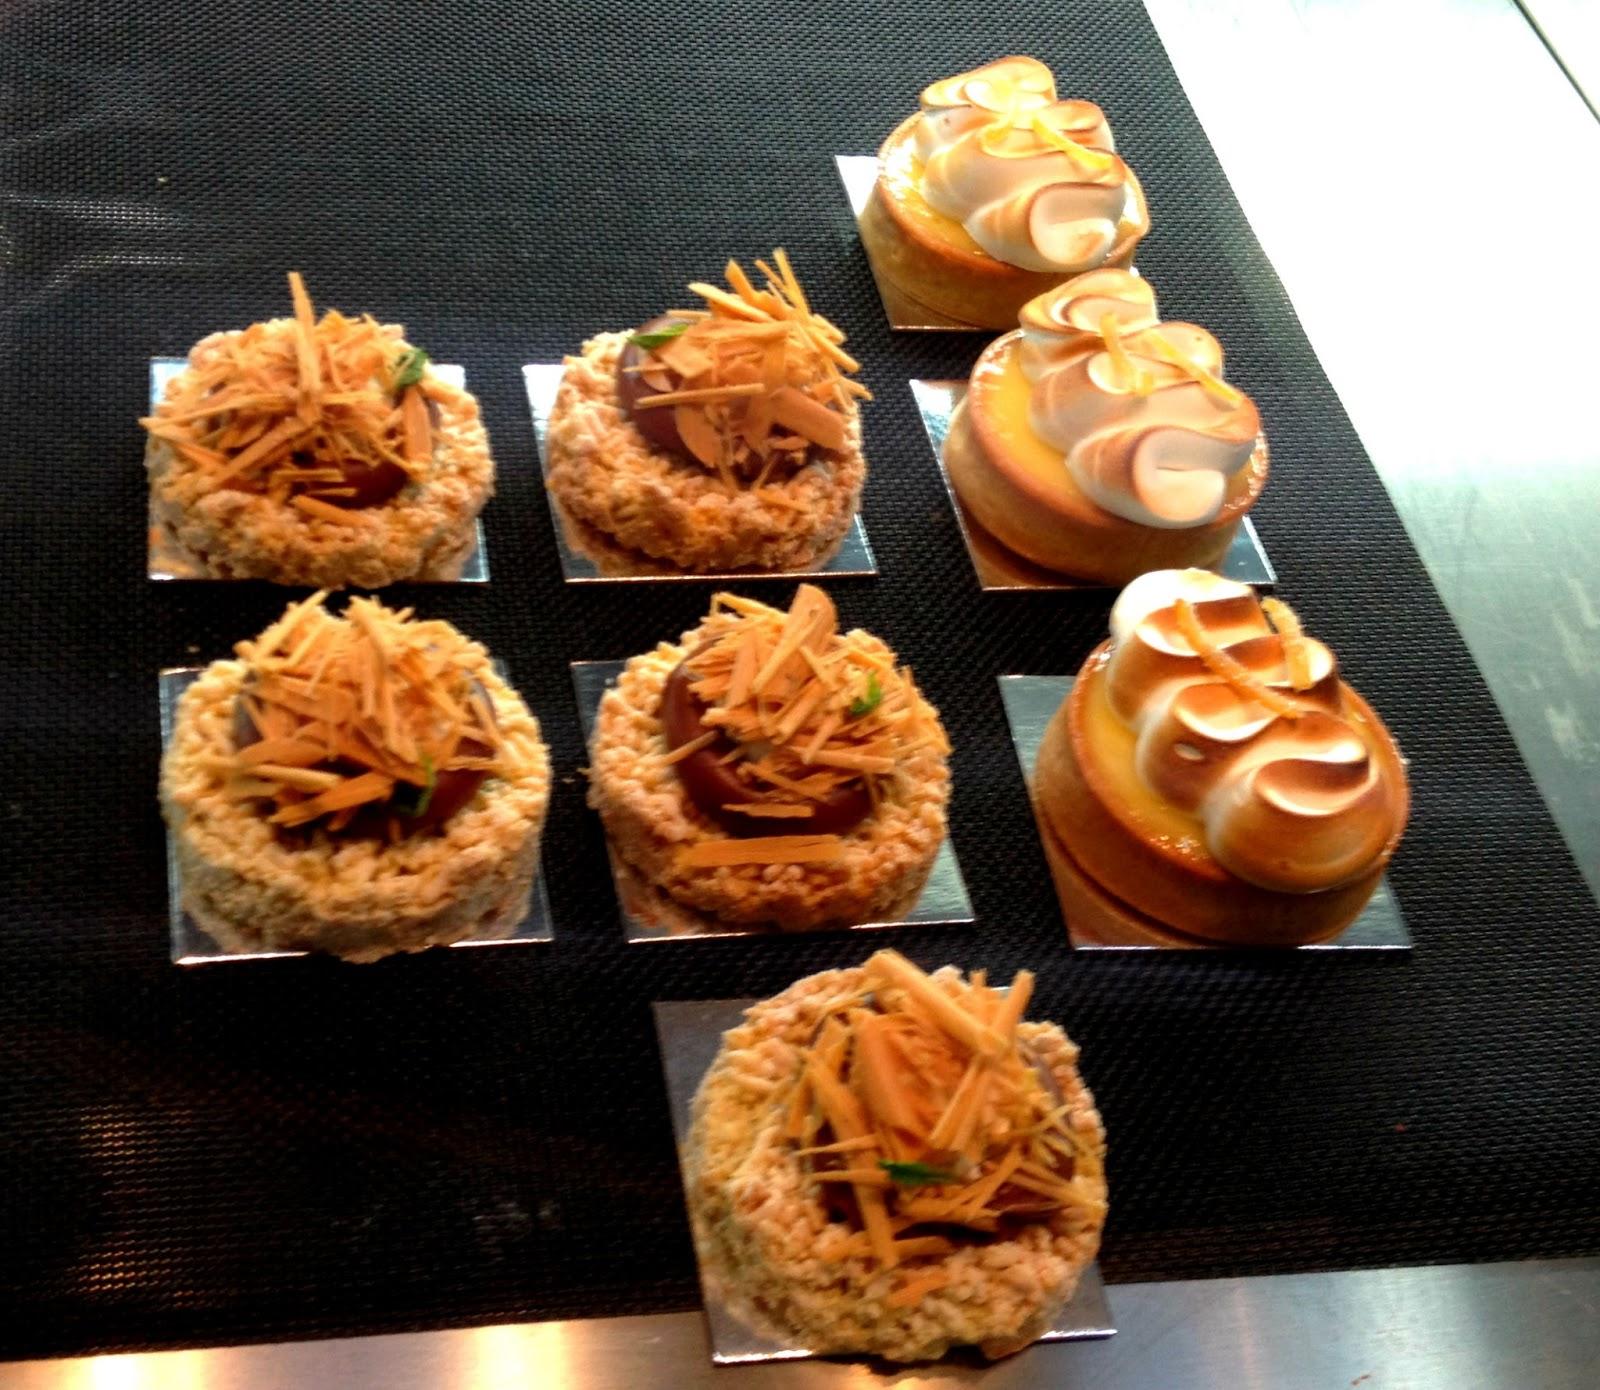 (L) Milk chocolate, vanilla ricotta tart, lavender semolina crumbs; (R) Lime, almond toasted meringue tart